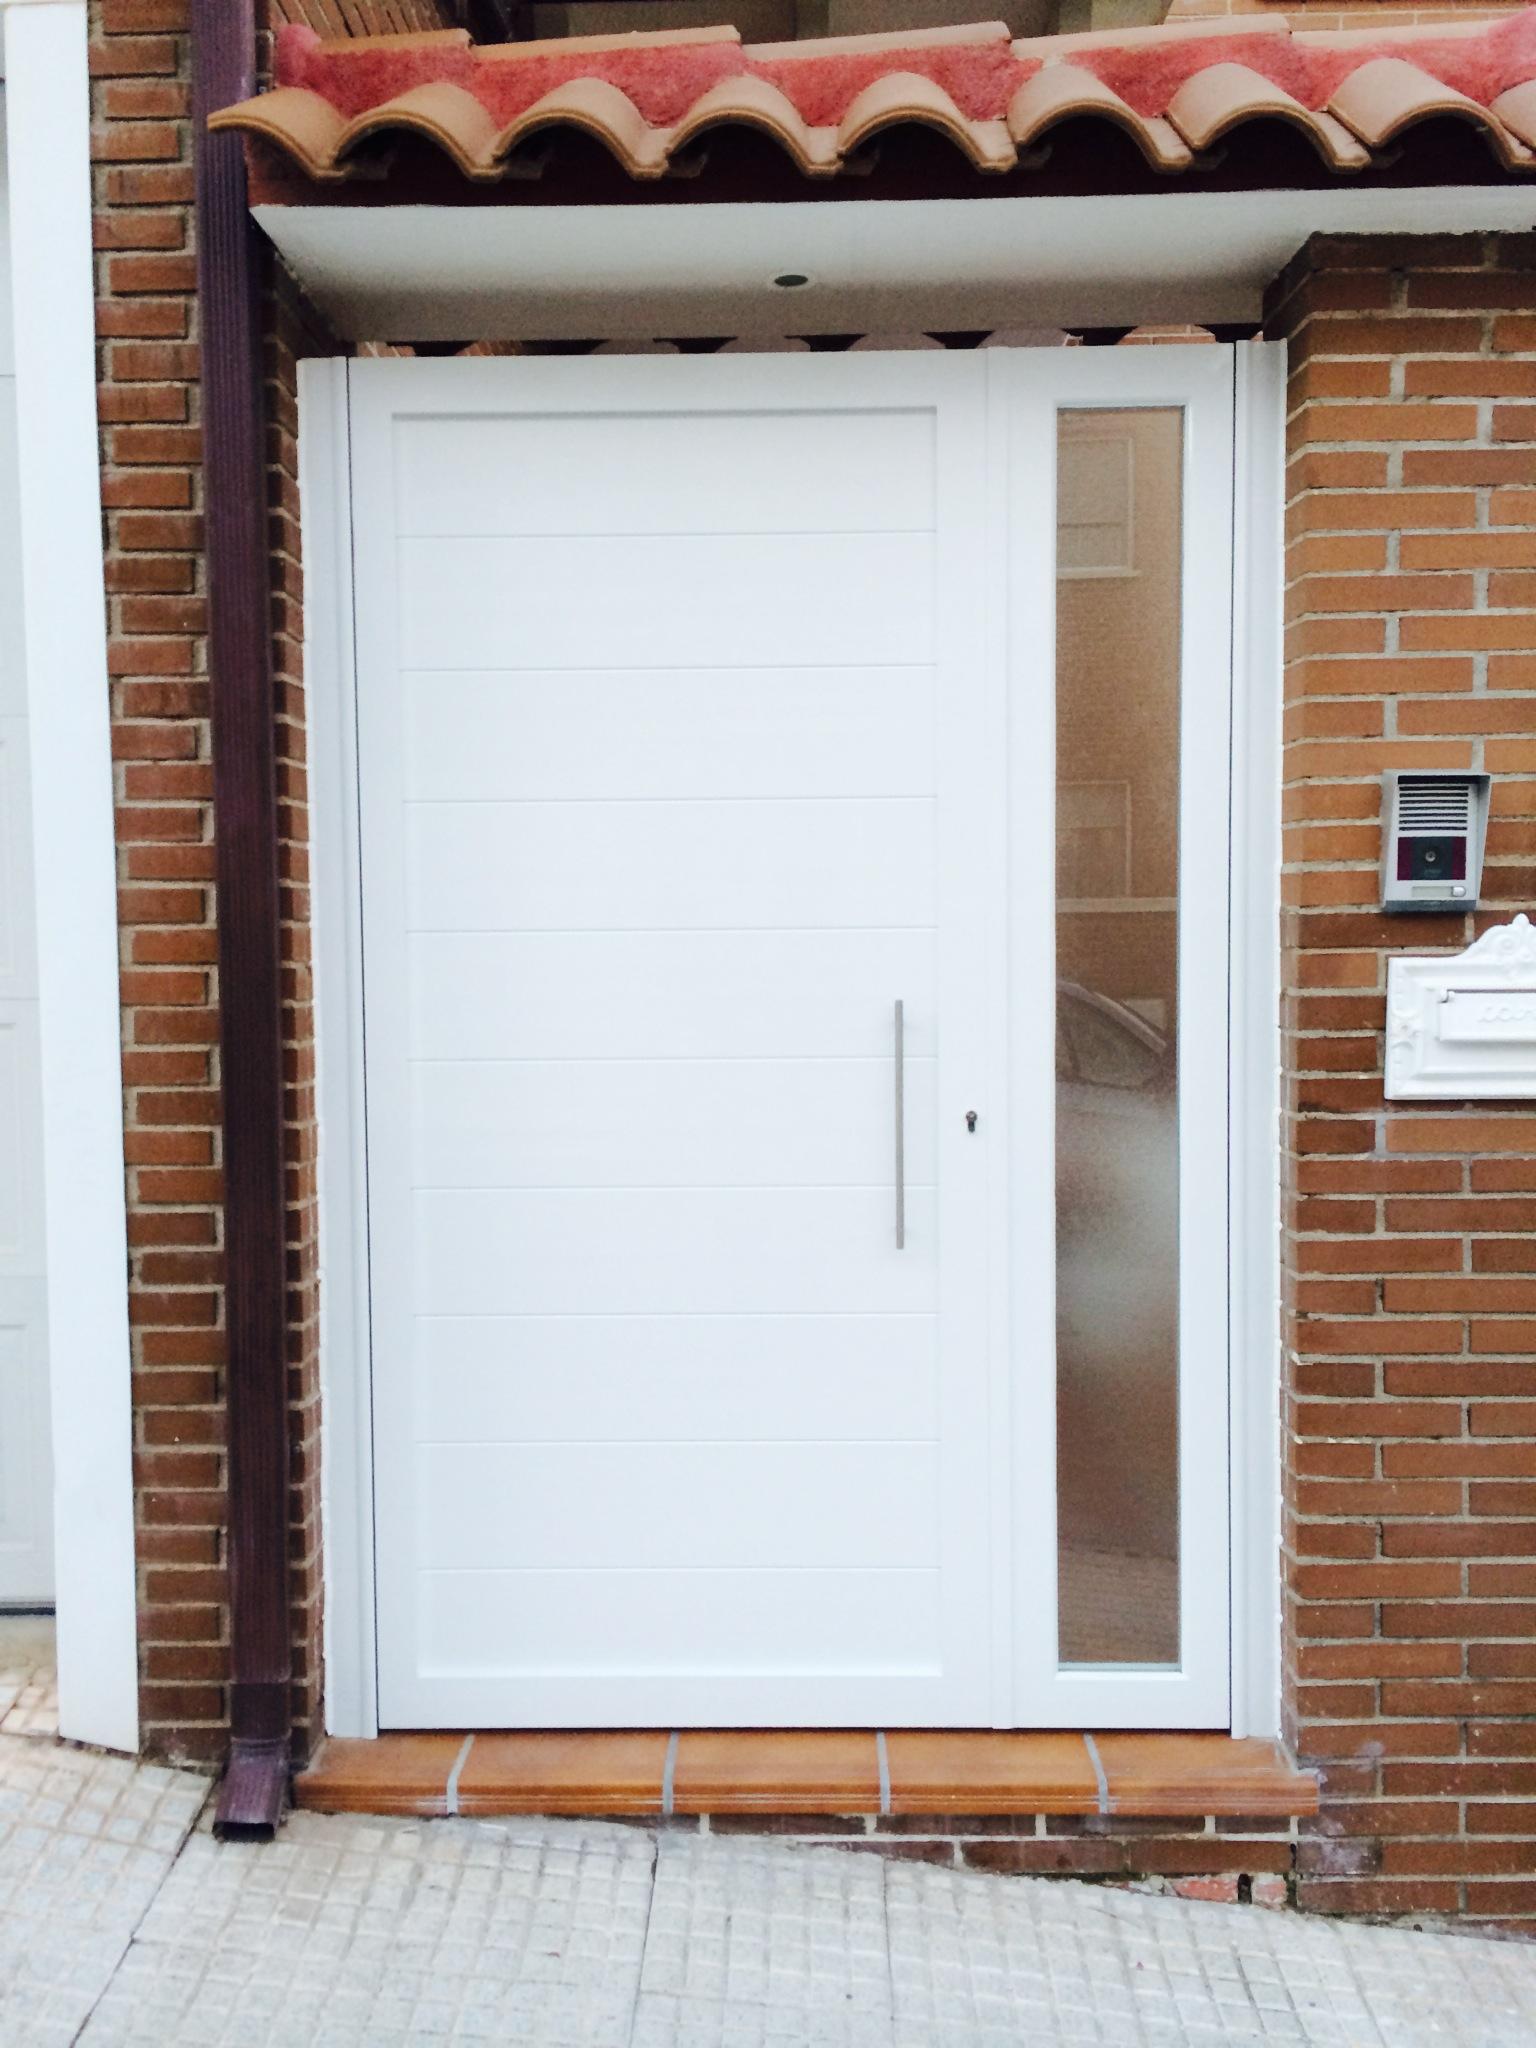 Puertas con carisma aluminio soldado modelo gri on con for Puertas de aluminio